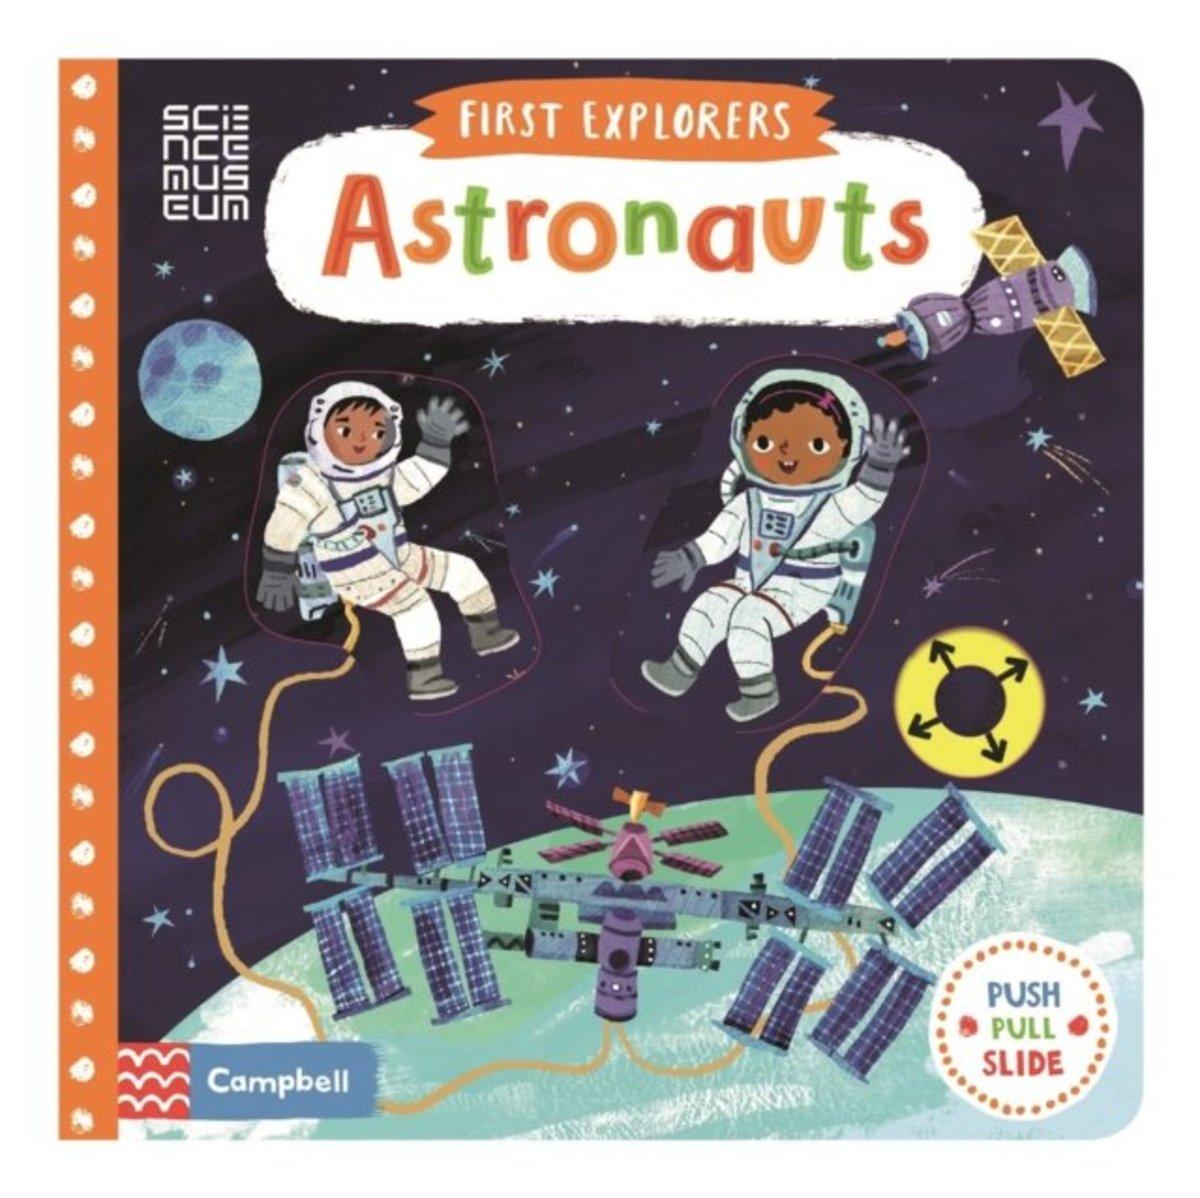 First Explorers: Astronauts